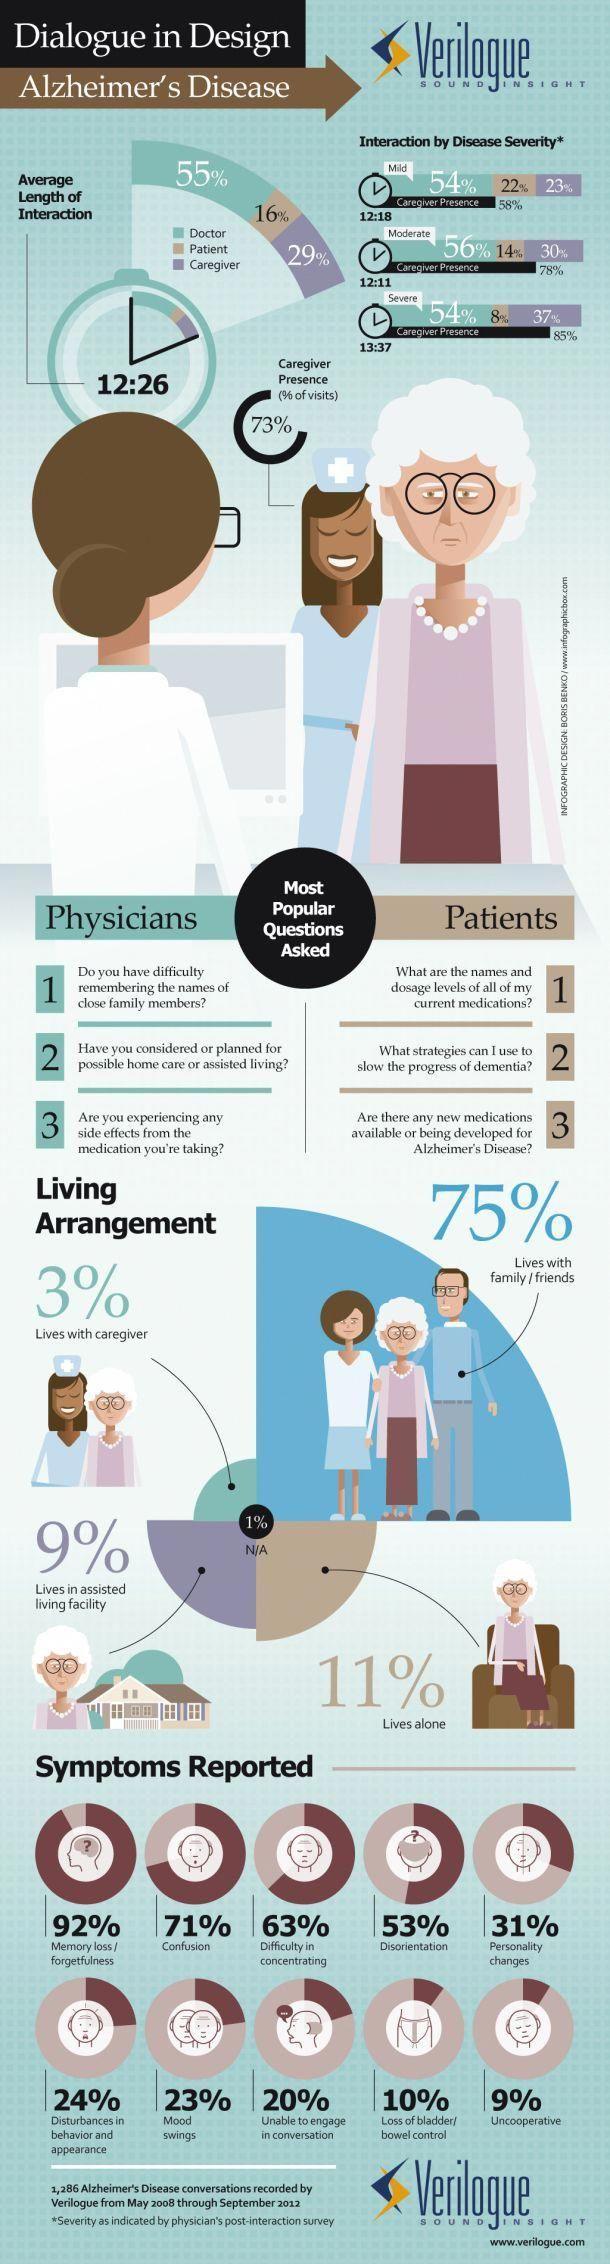 Healthcare infographic : Dialogue in Design: Alzheimer's Disease [INFOGRAPHIC] #elderlycarealzheimers